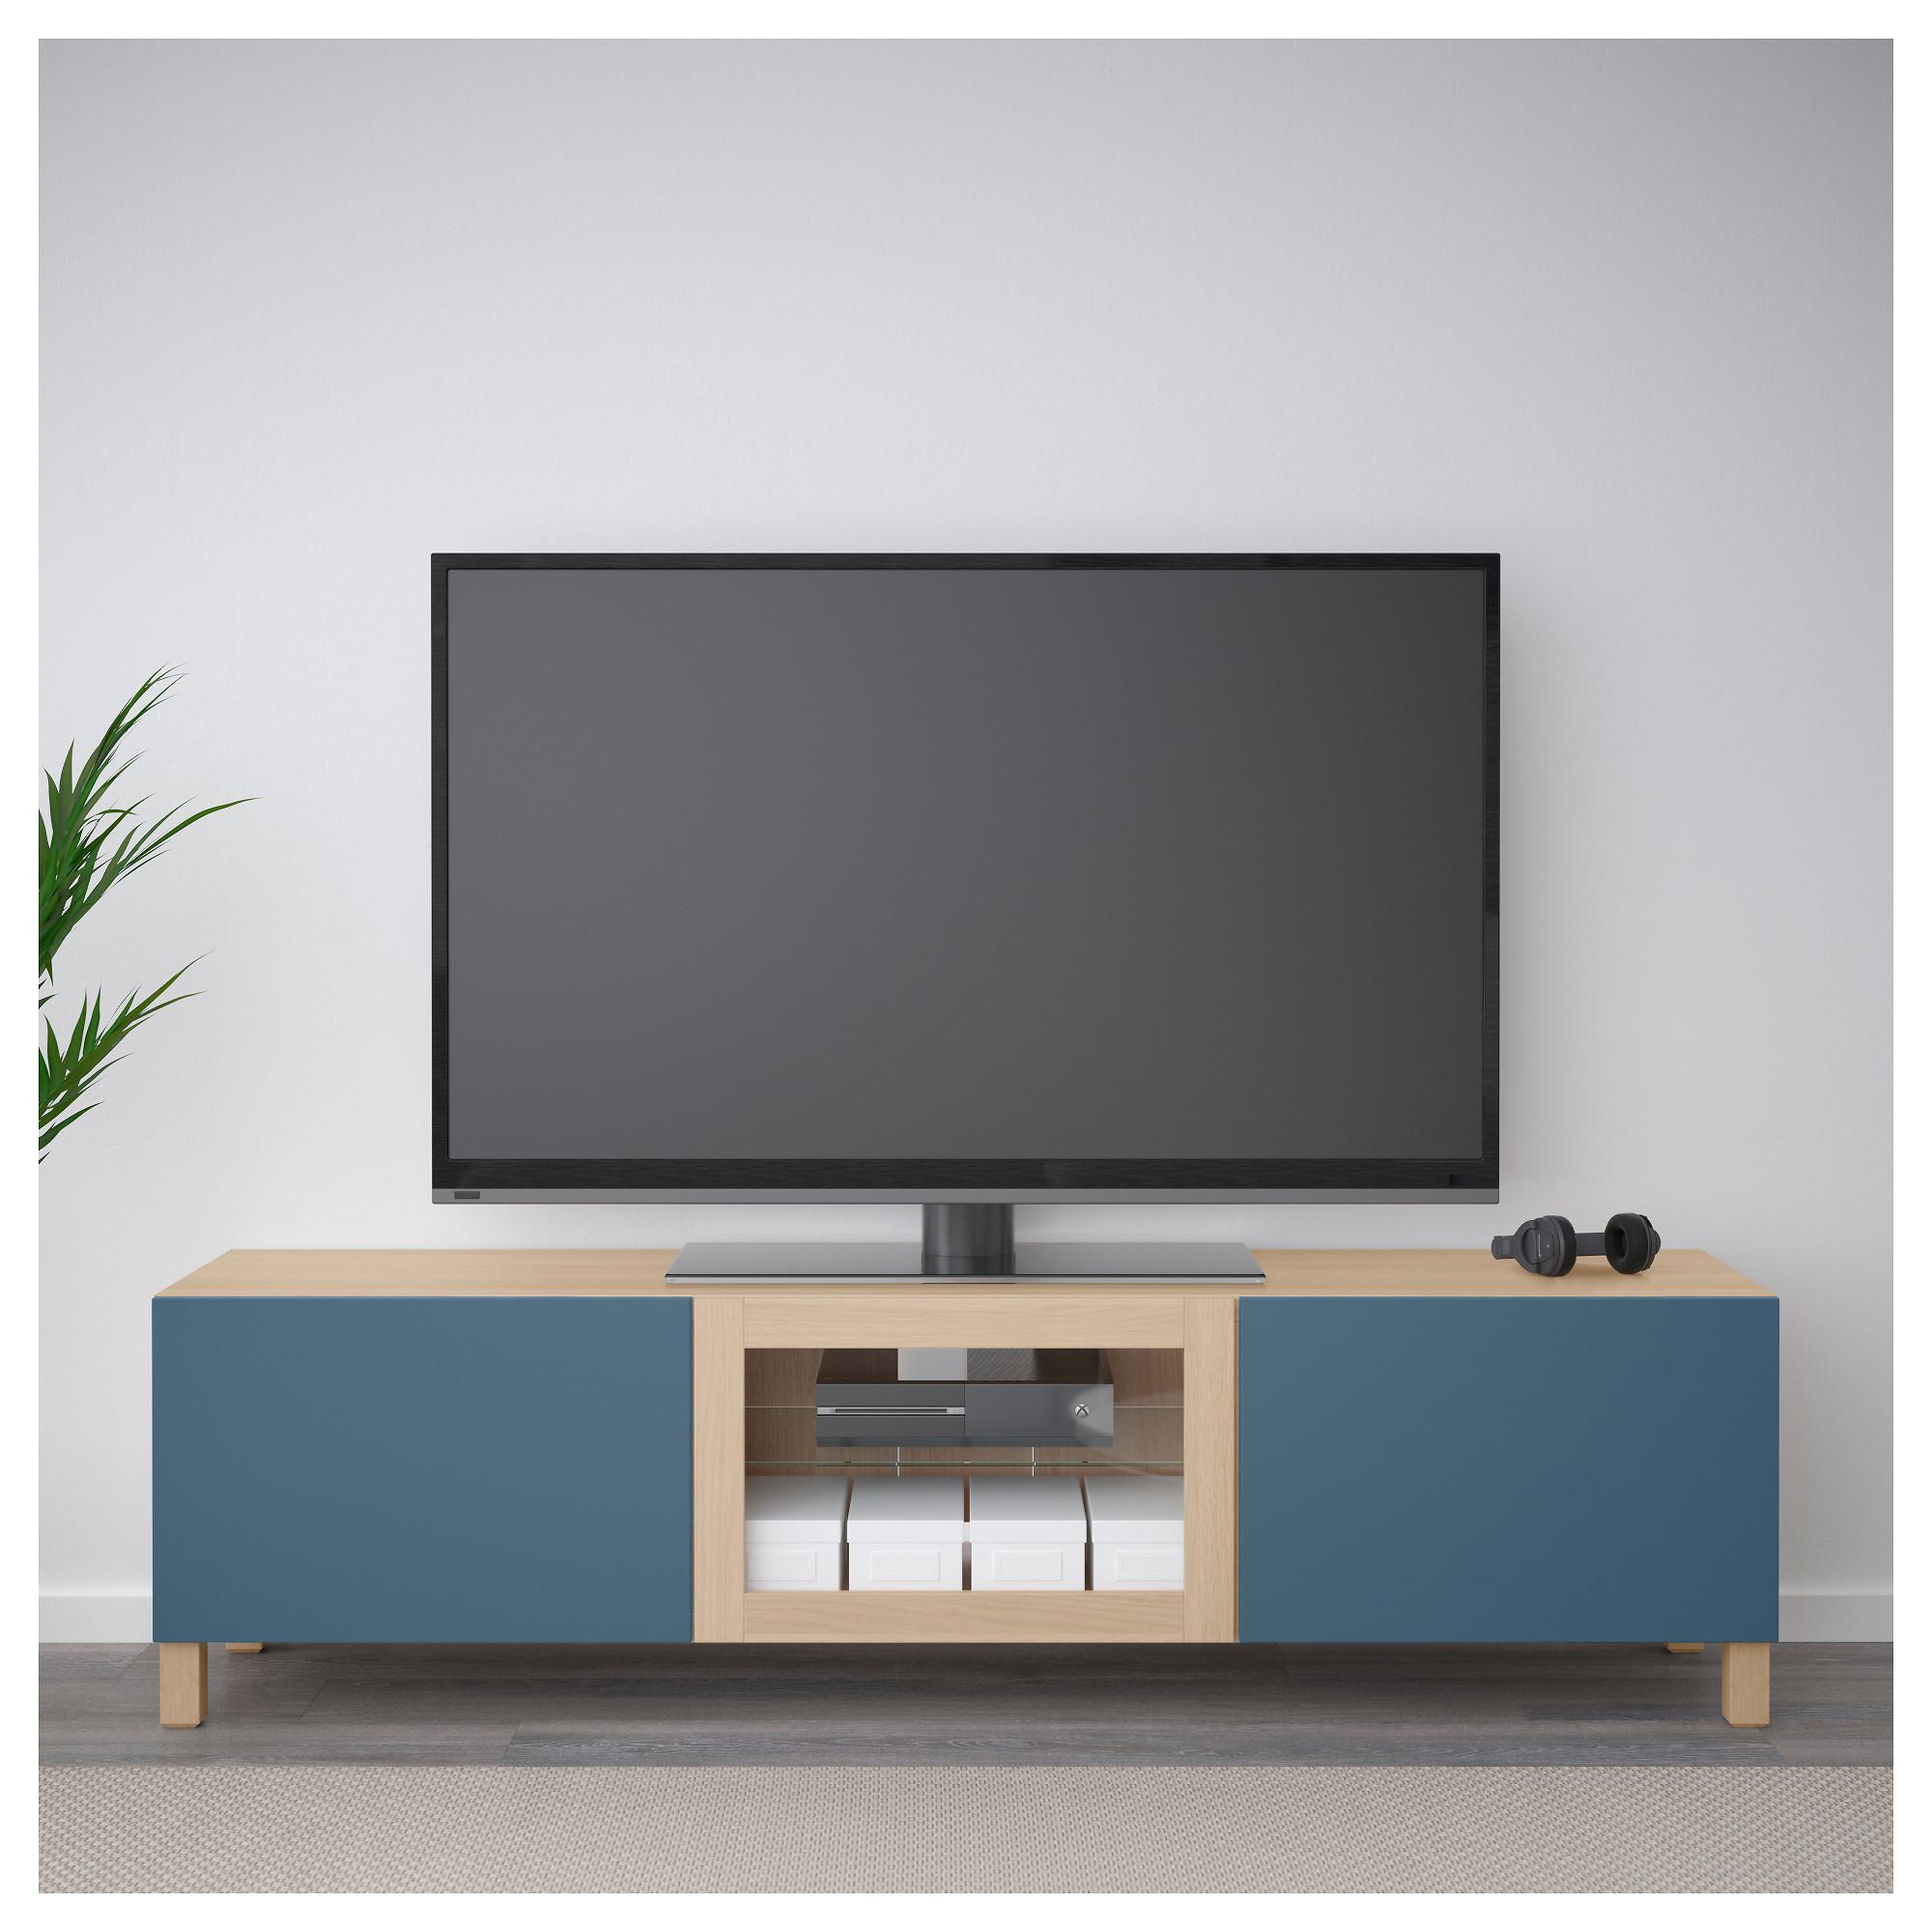 Тумба под ТВ с ящиками и дверцей БЕСТО темно-синий артикуль № 092.506.88 в наличии. Интернет магазин IKEA РБ. Быстрая доставка и монтаж.